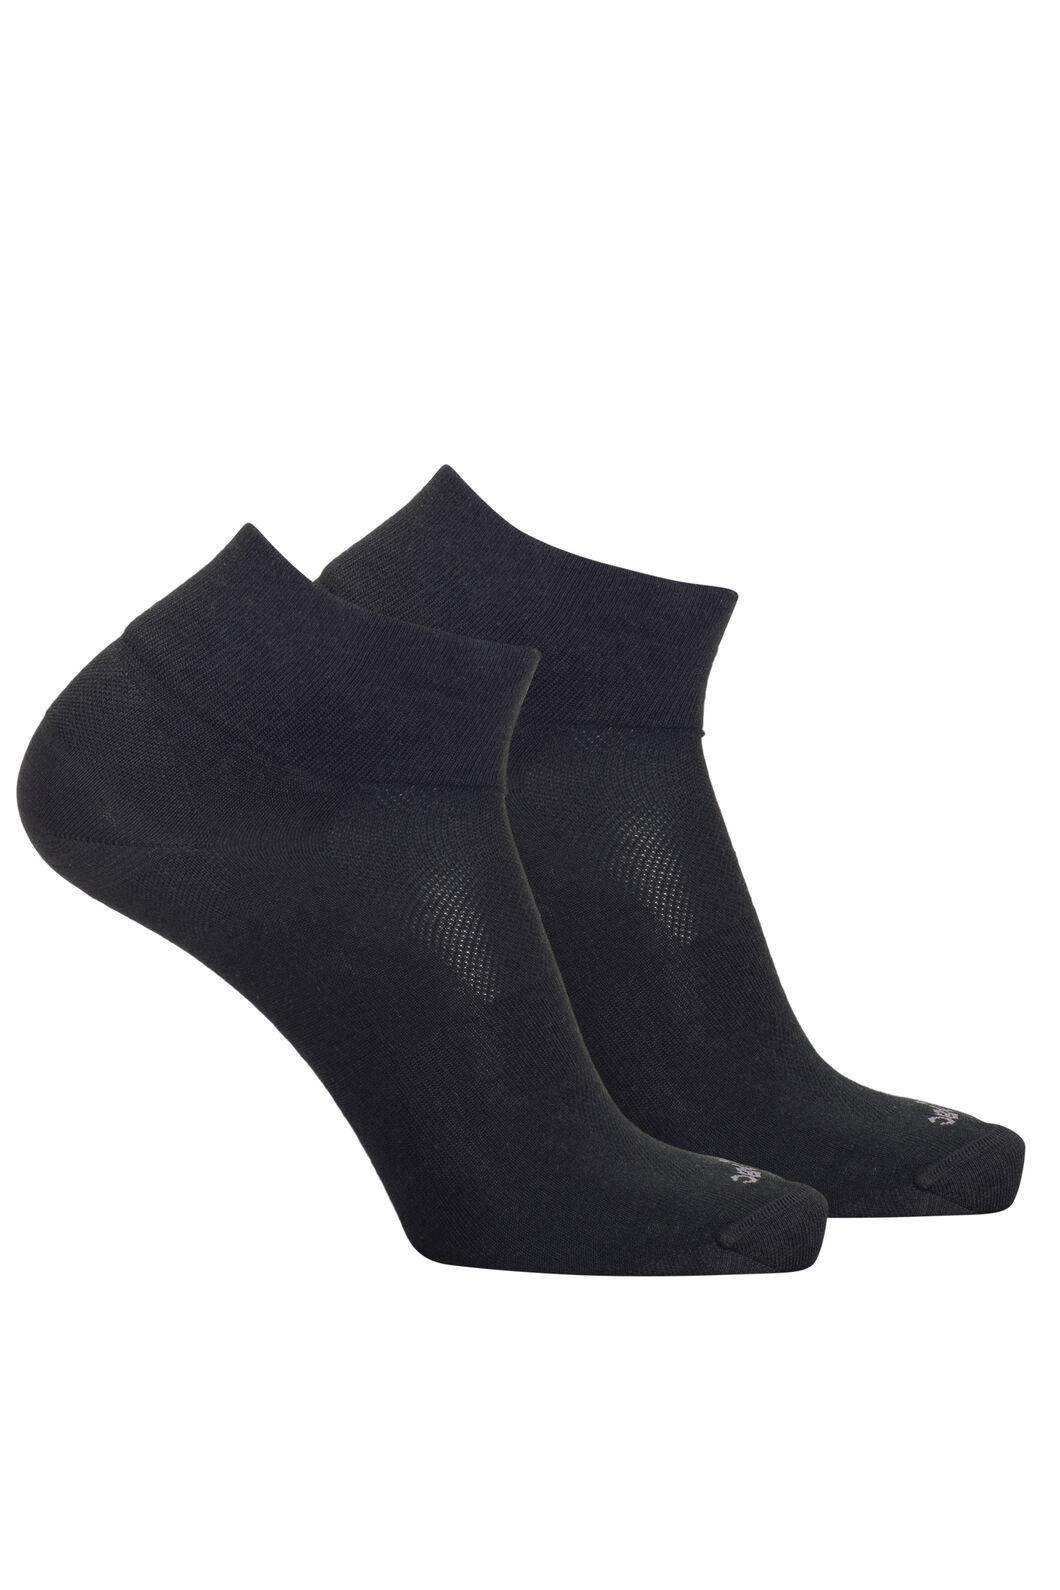 Macpac Merino Blend Quarter Socks — 2 Pack, Black, hi-res